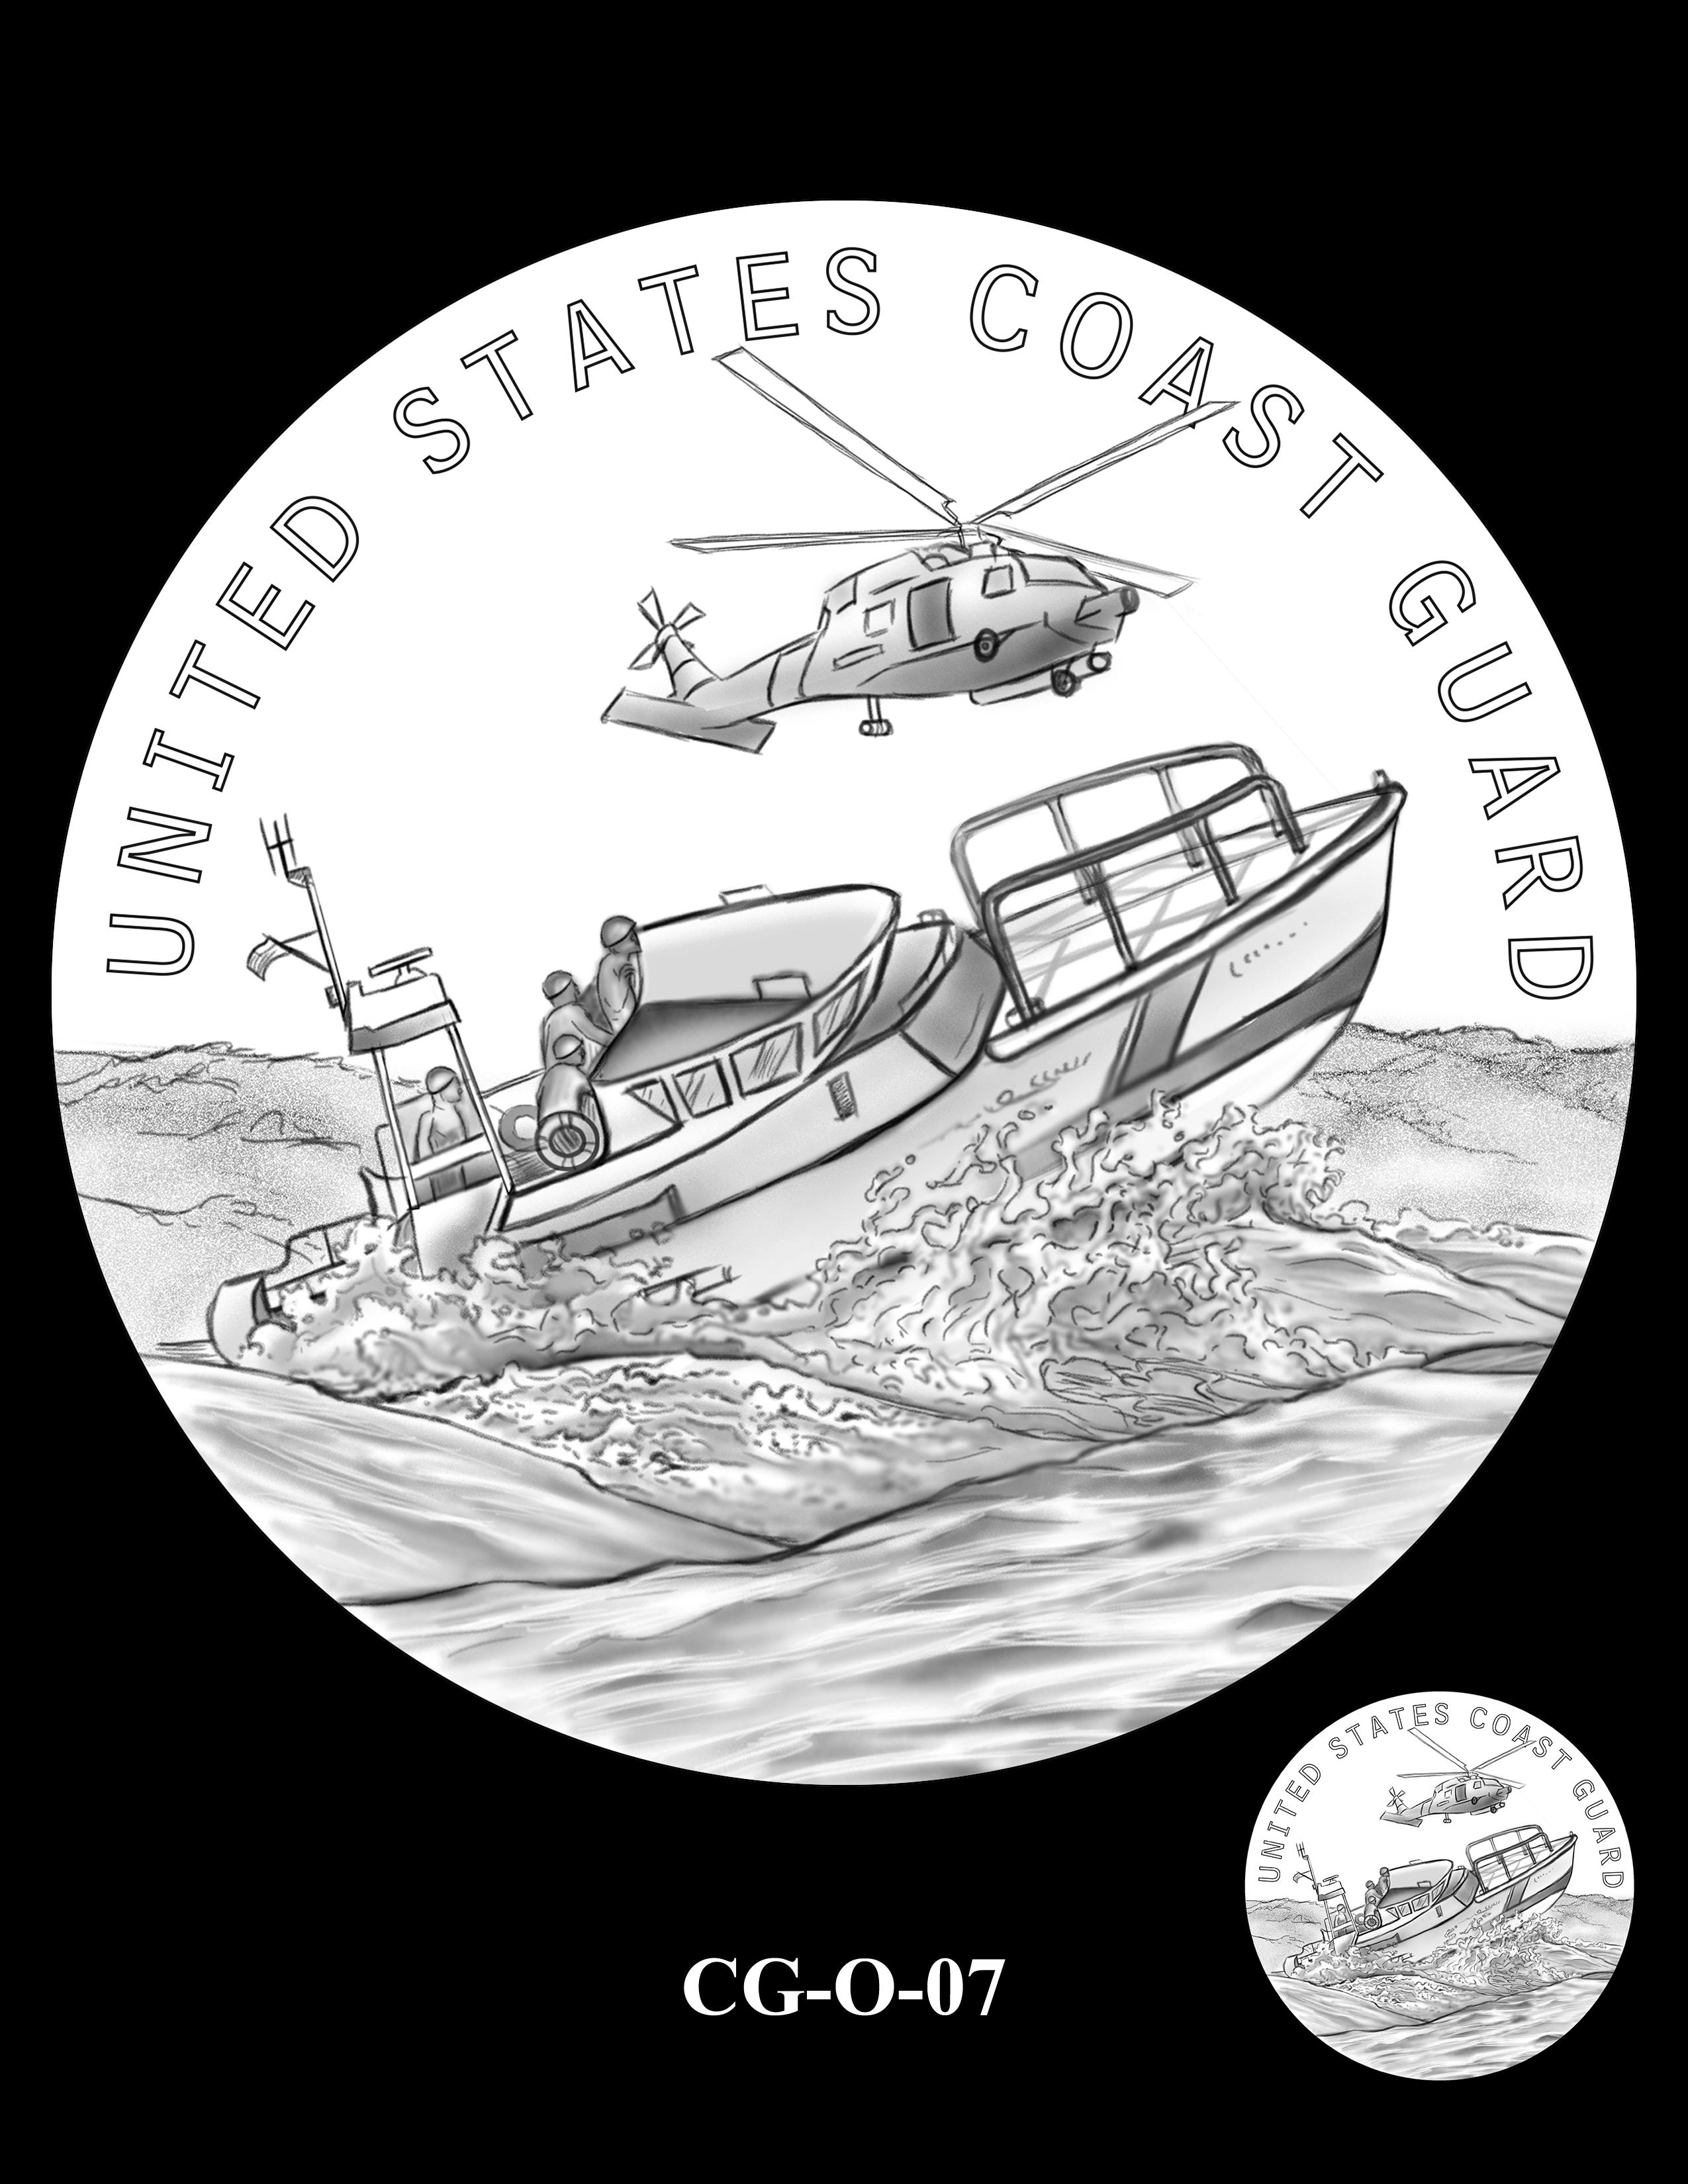 CG-O-07 -- Armed Forces Medal - Coast Guard